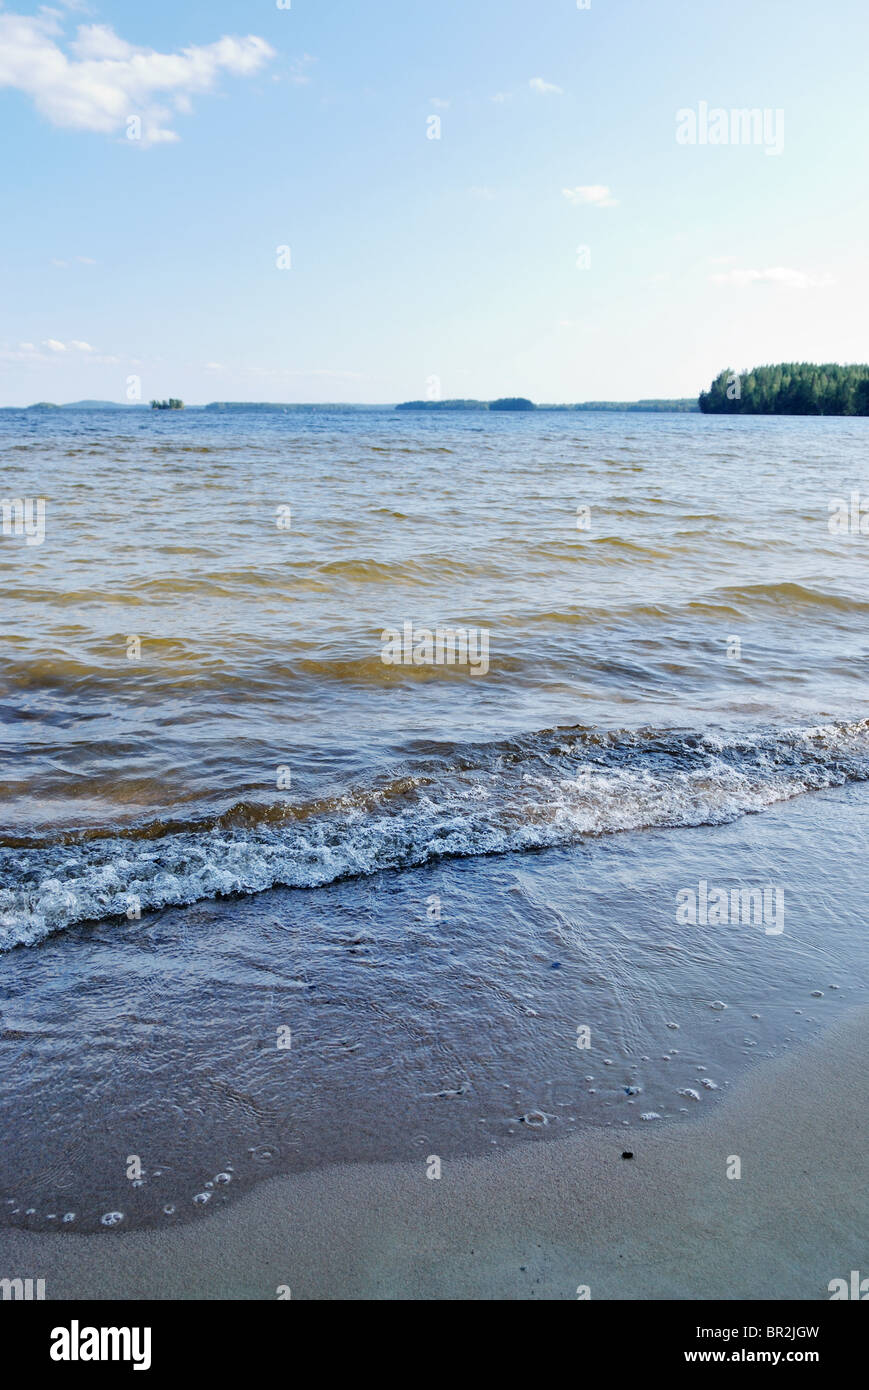 Hiekanpaa beach by lake Pyhajarvi, Kitee, eastern Finland - Stock Image